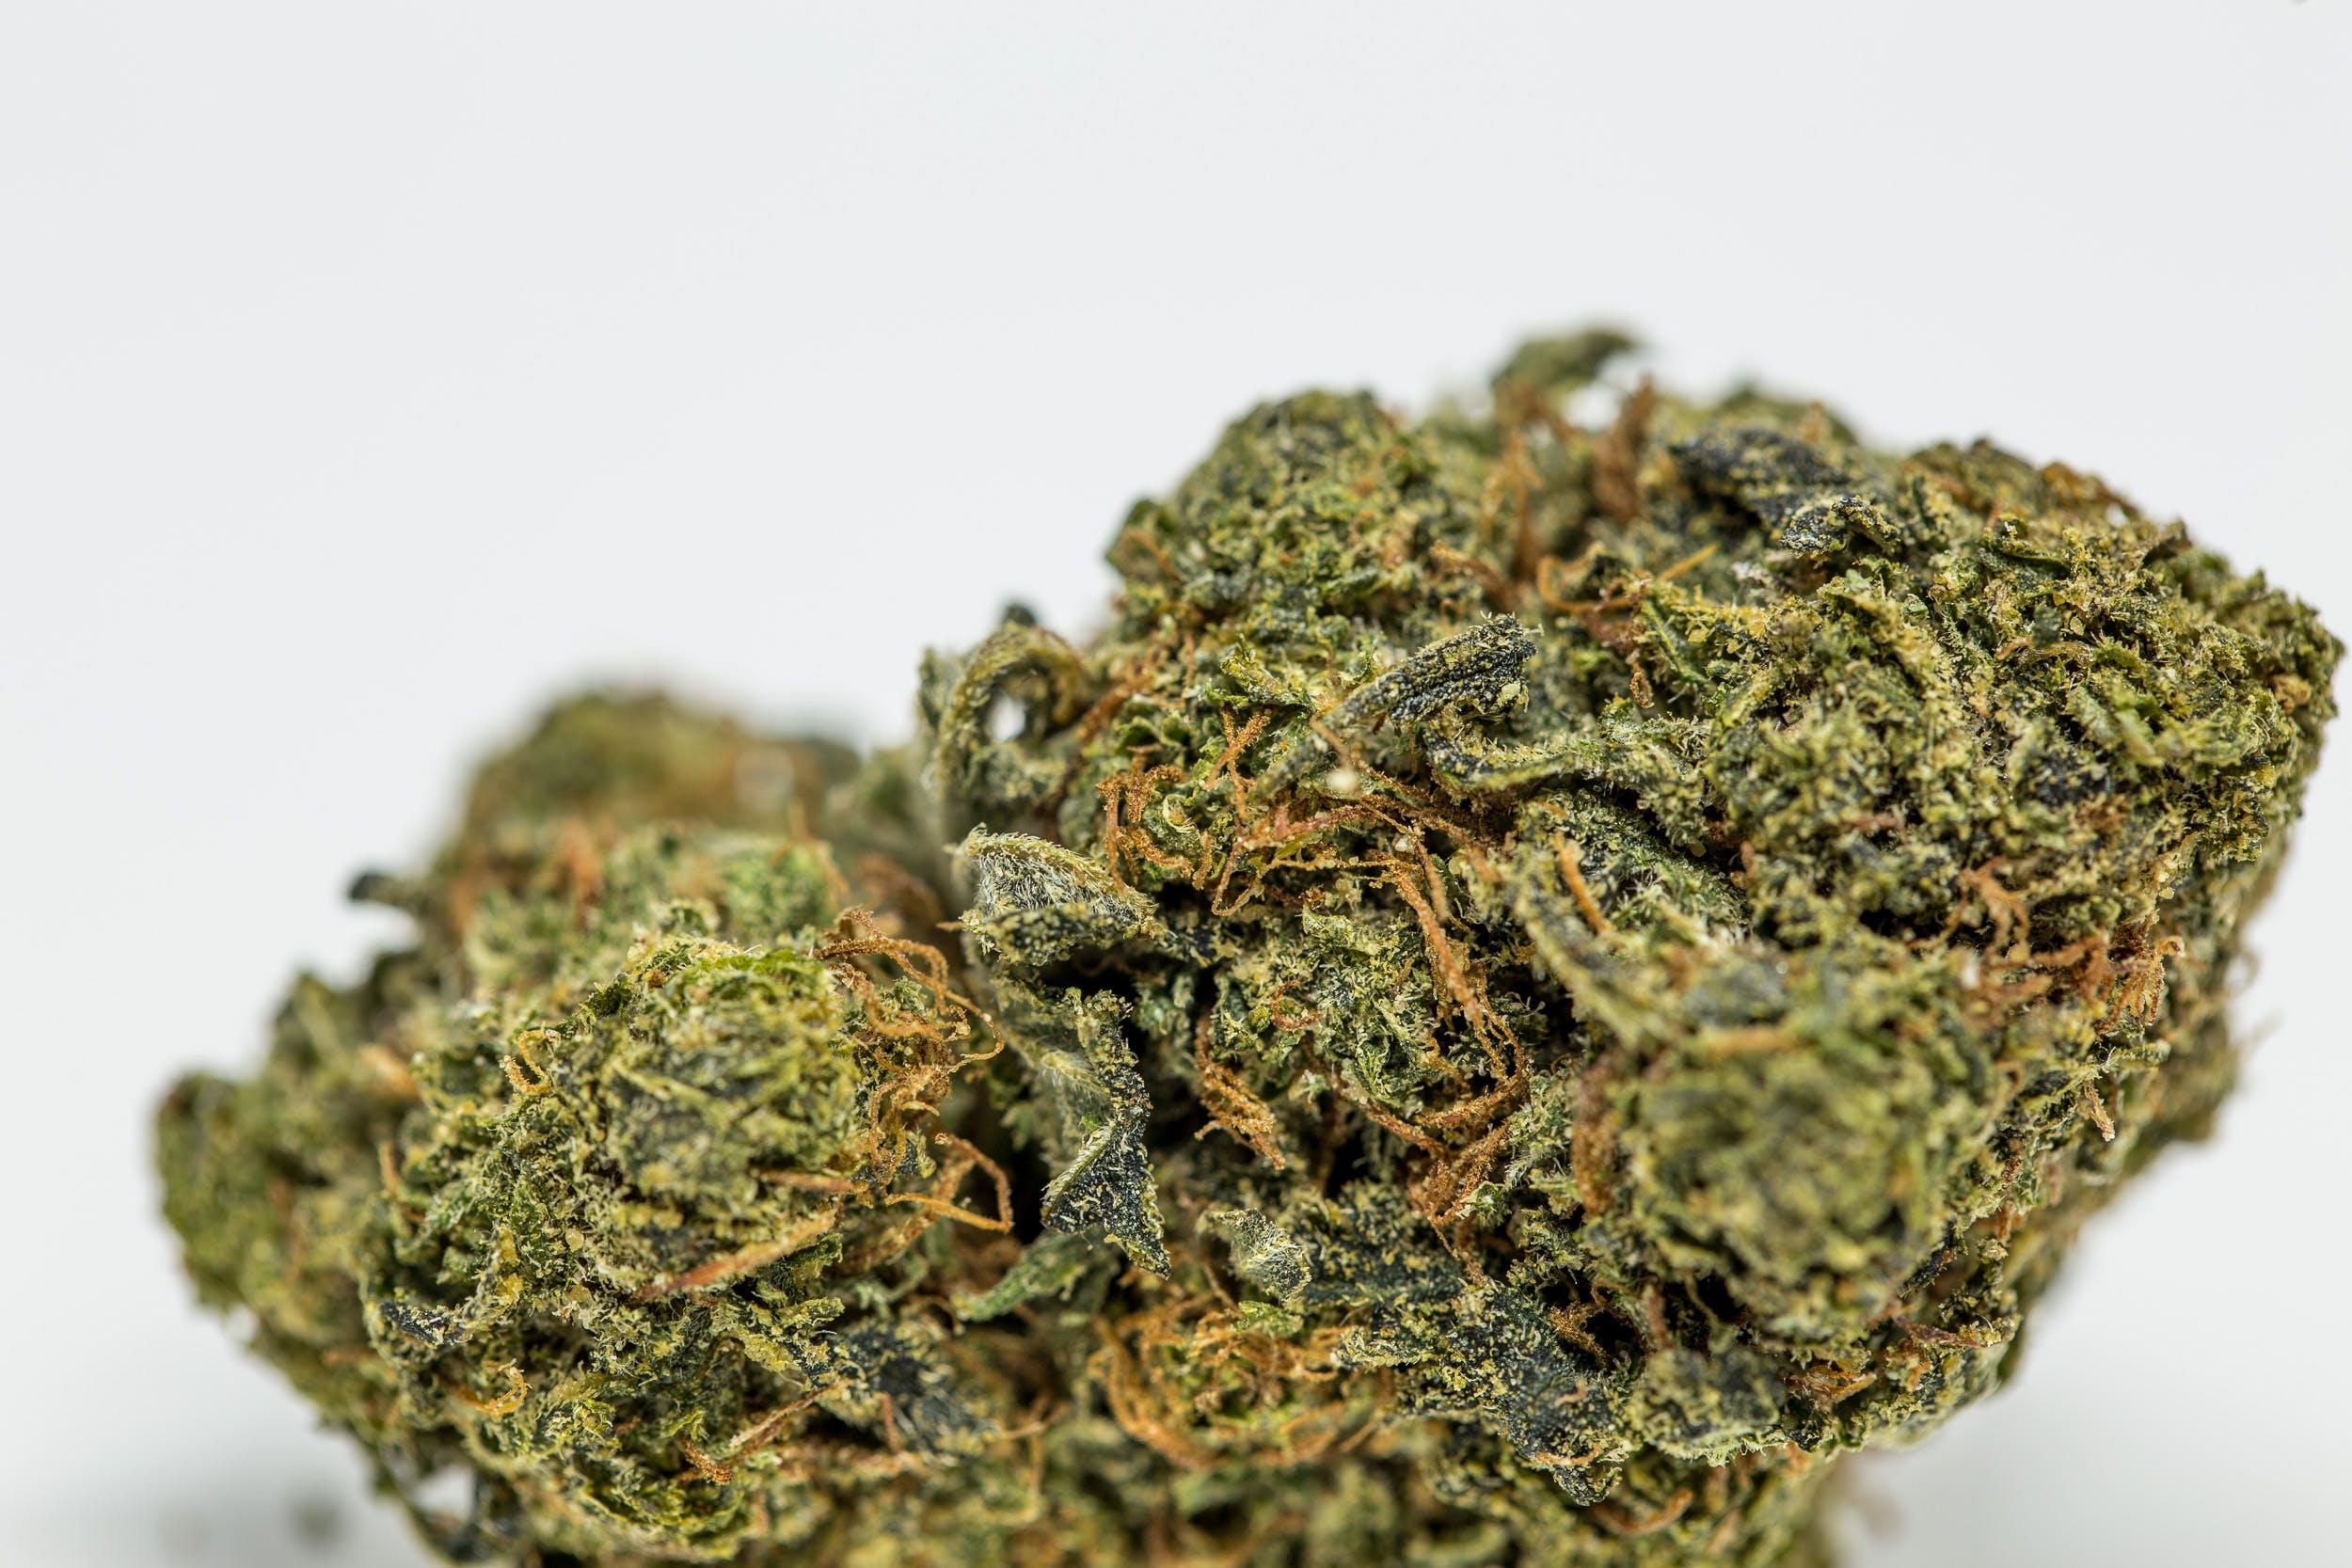 Green Crack Weed; Green Crack Cannabis Strain; Green Crack Sativa Strain